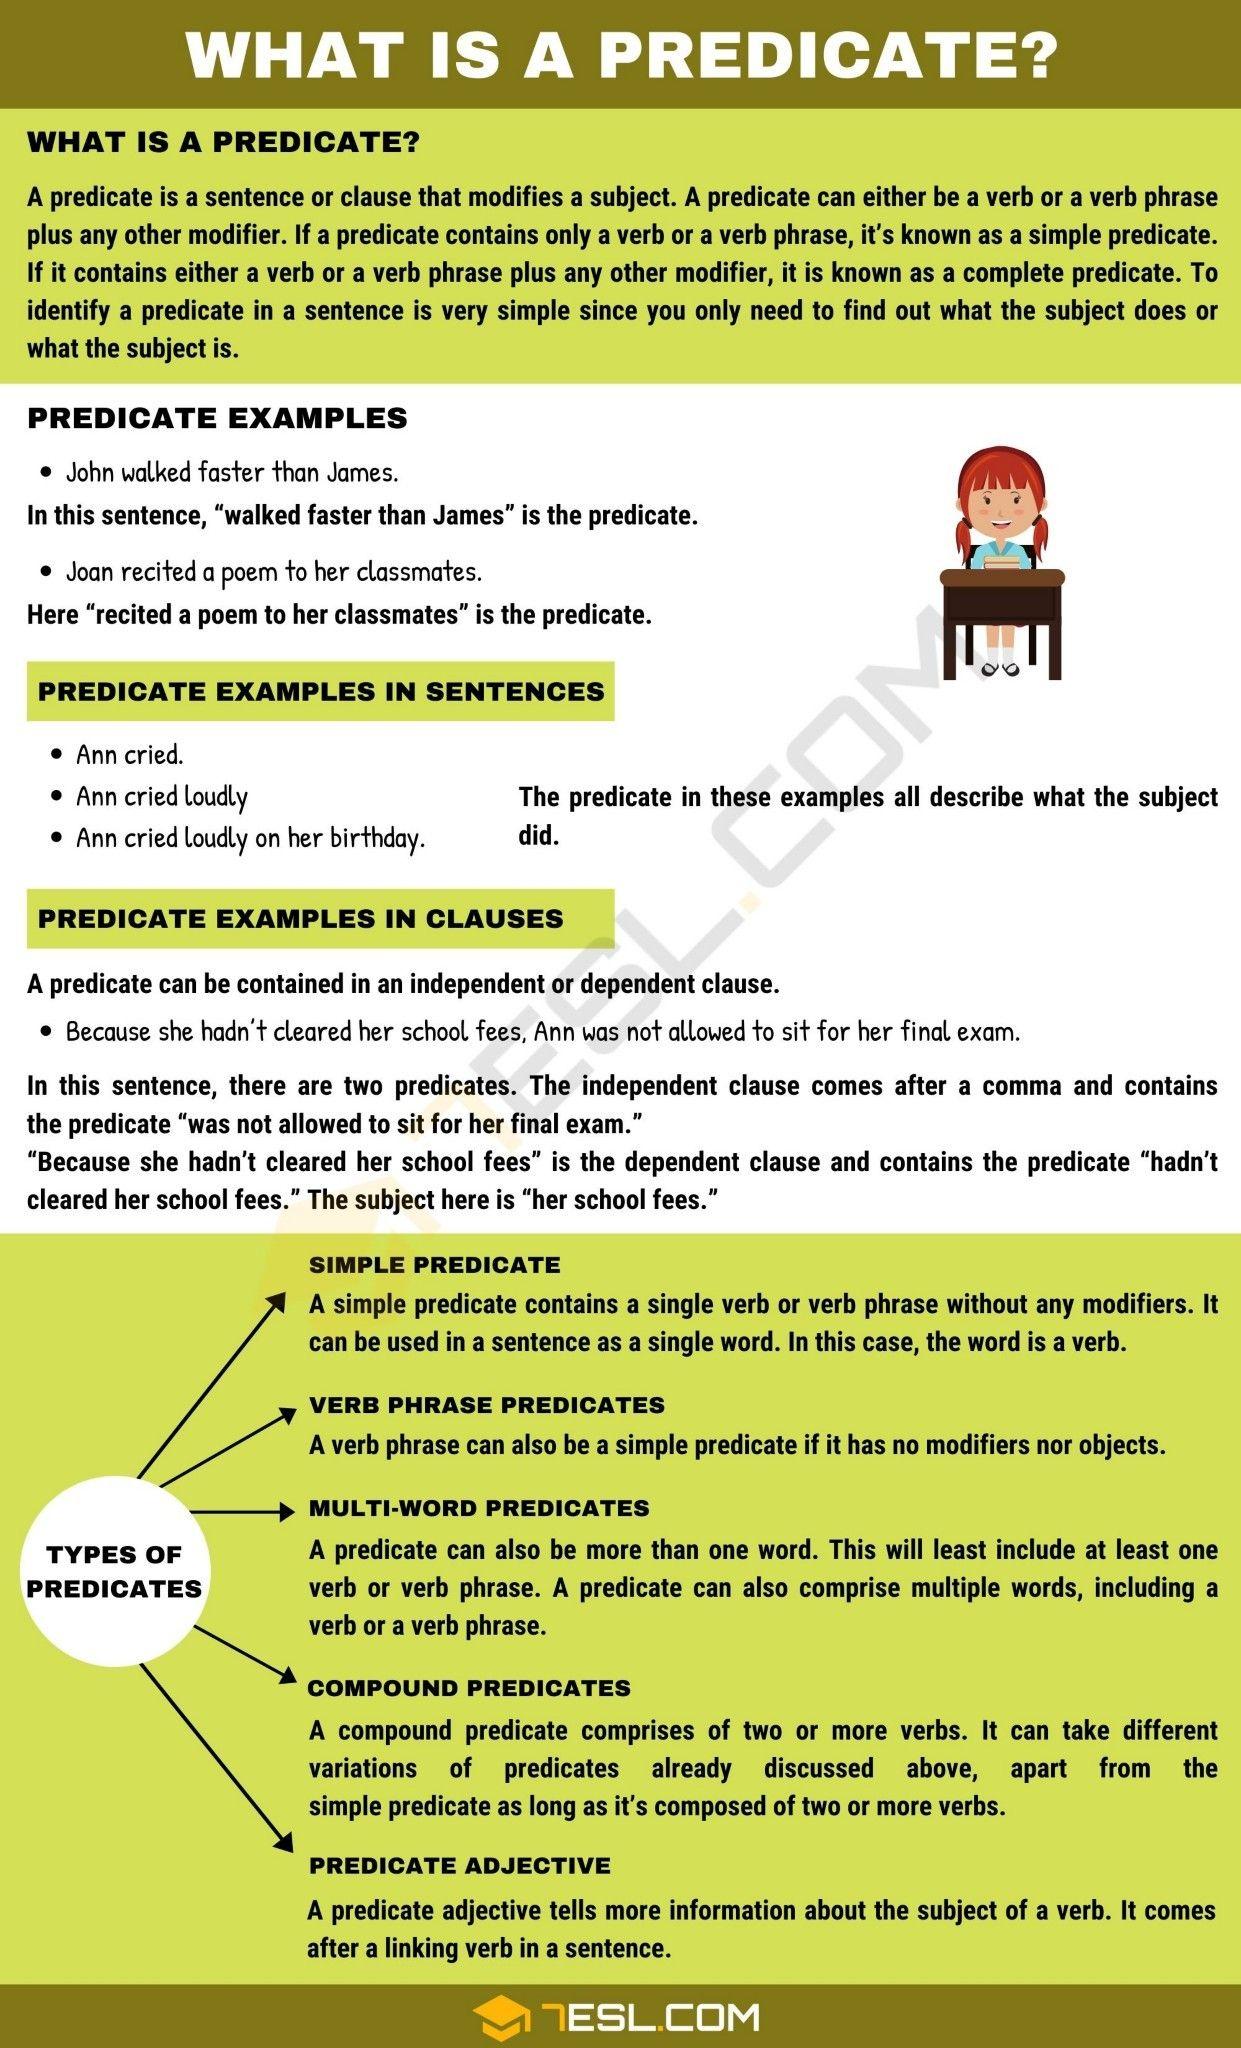 Pin By Ali Ramadan On Learning English English Writing Skills English Vocabulary Learn English Vocabulary [ 2048 x 1241 Pixel ]